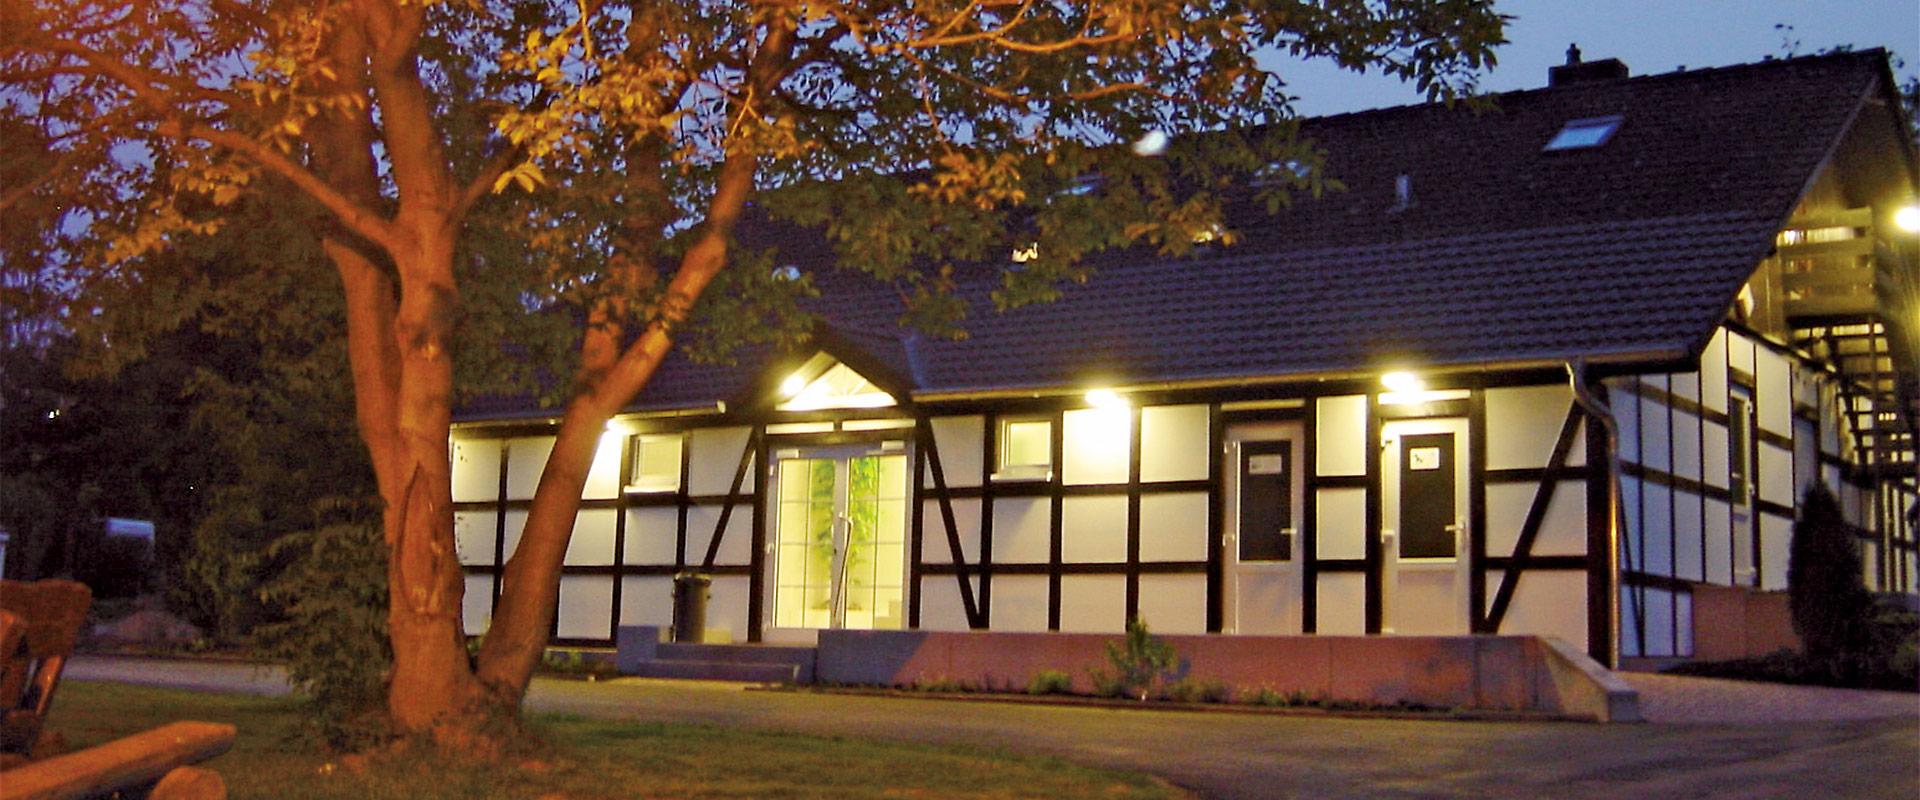 Ferienpark & Reisemobilstellplatz Teutoburger Wald/Barnrtrup